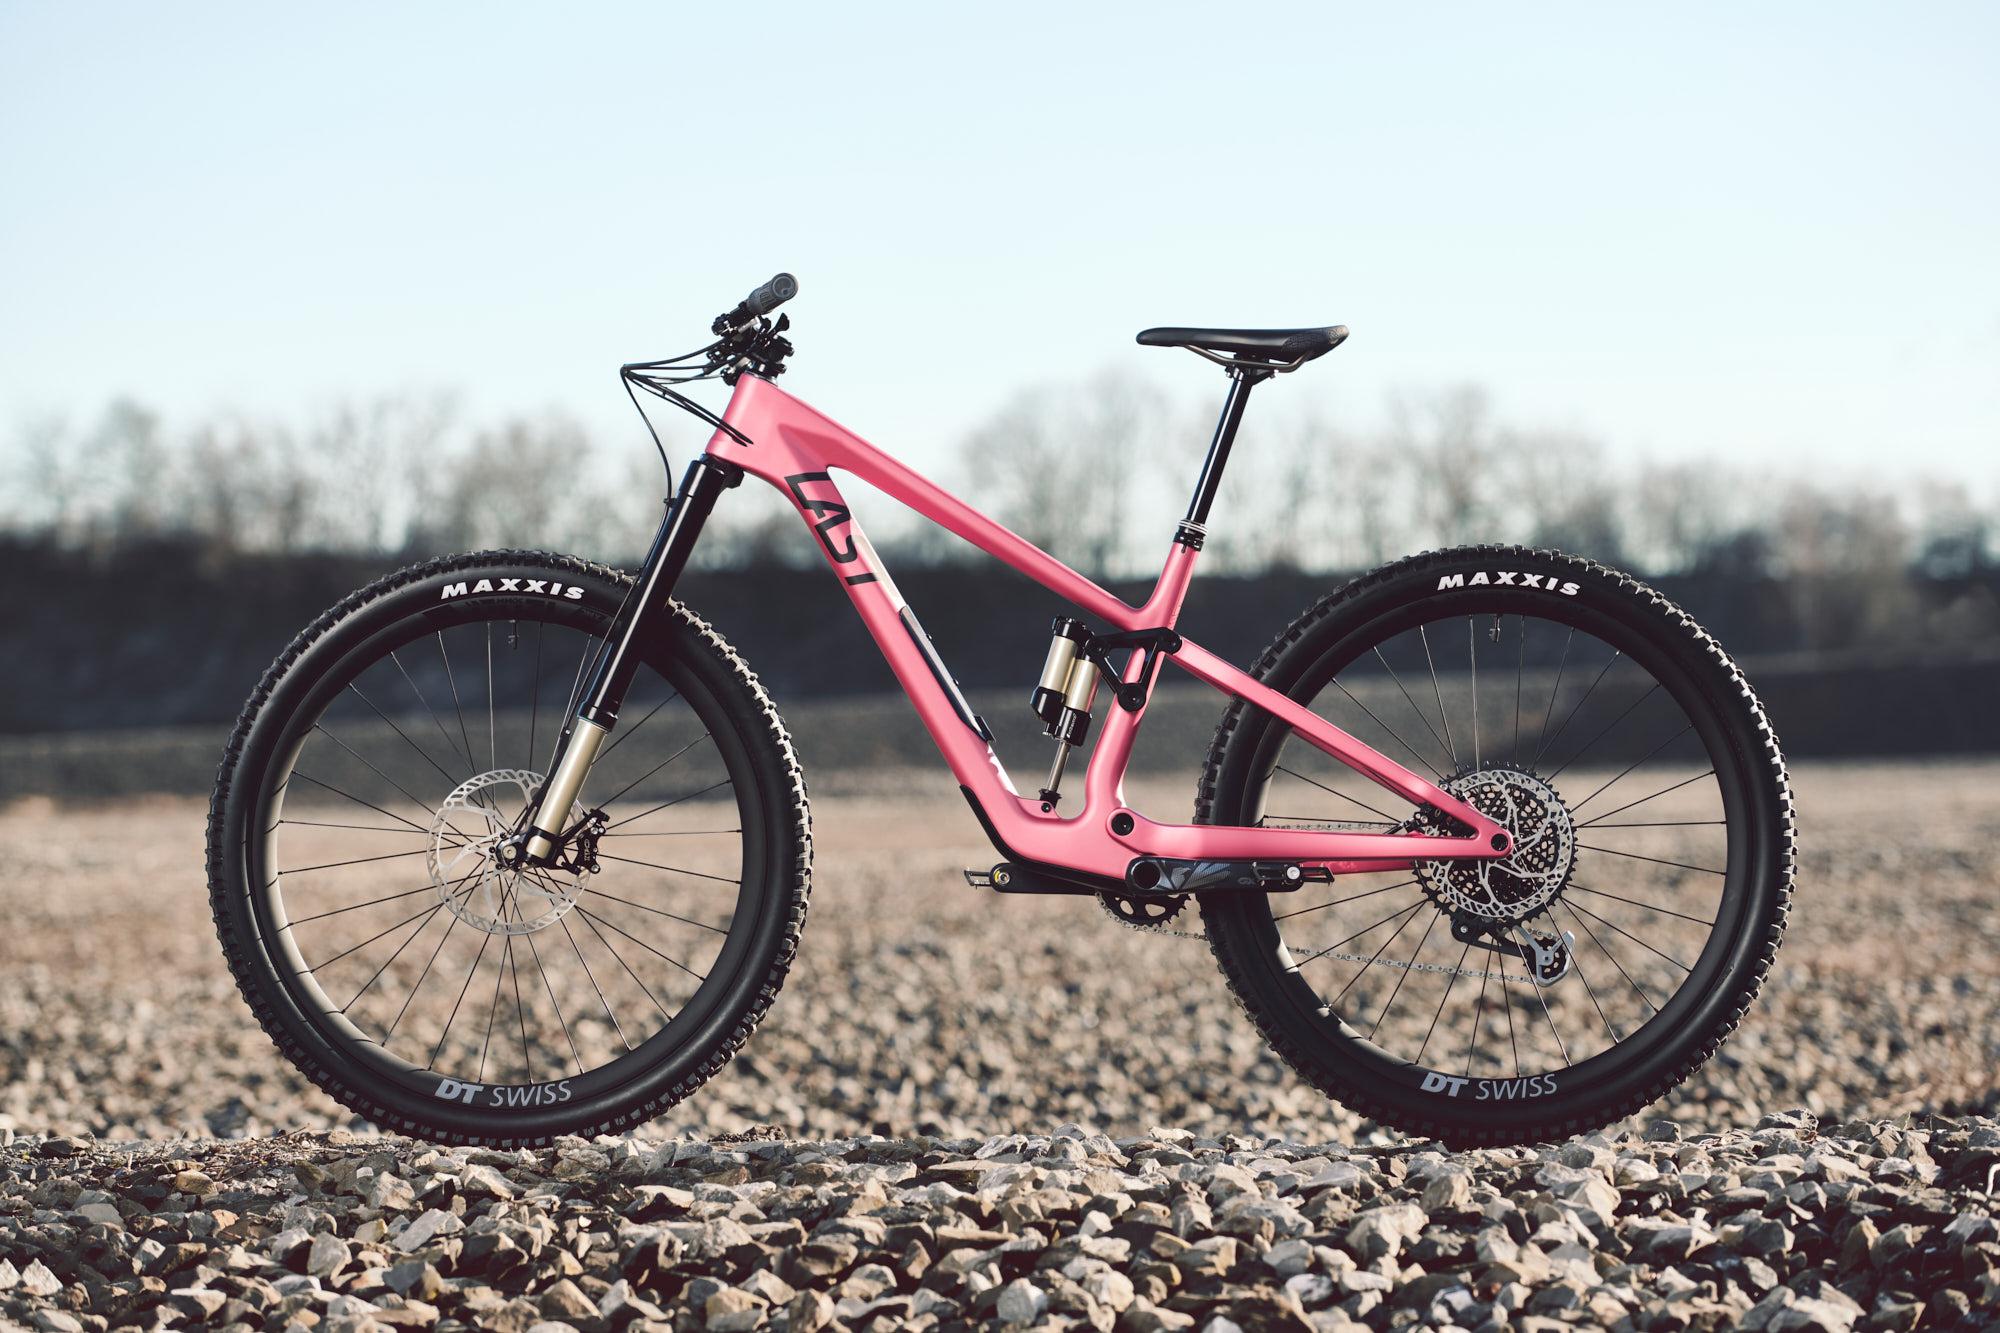 LAST CINTO Bike Outdoor 003 Cycleholix